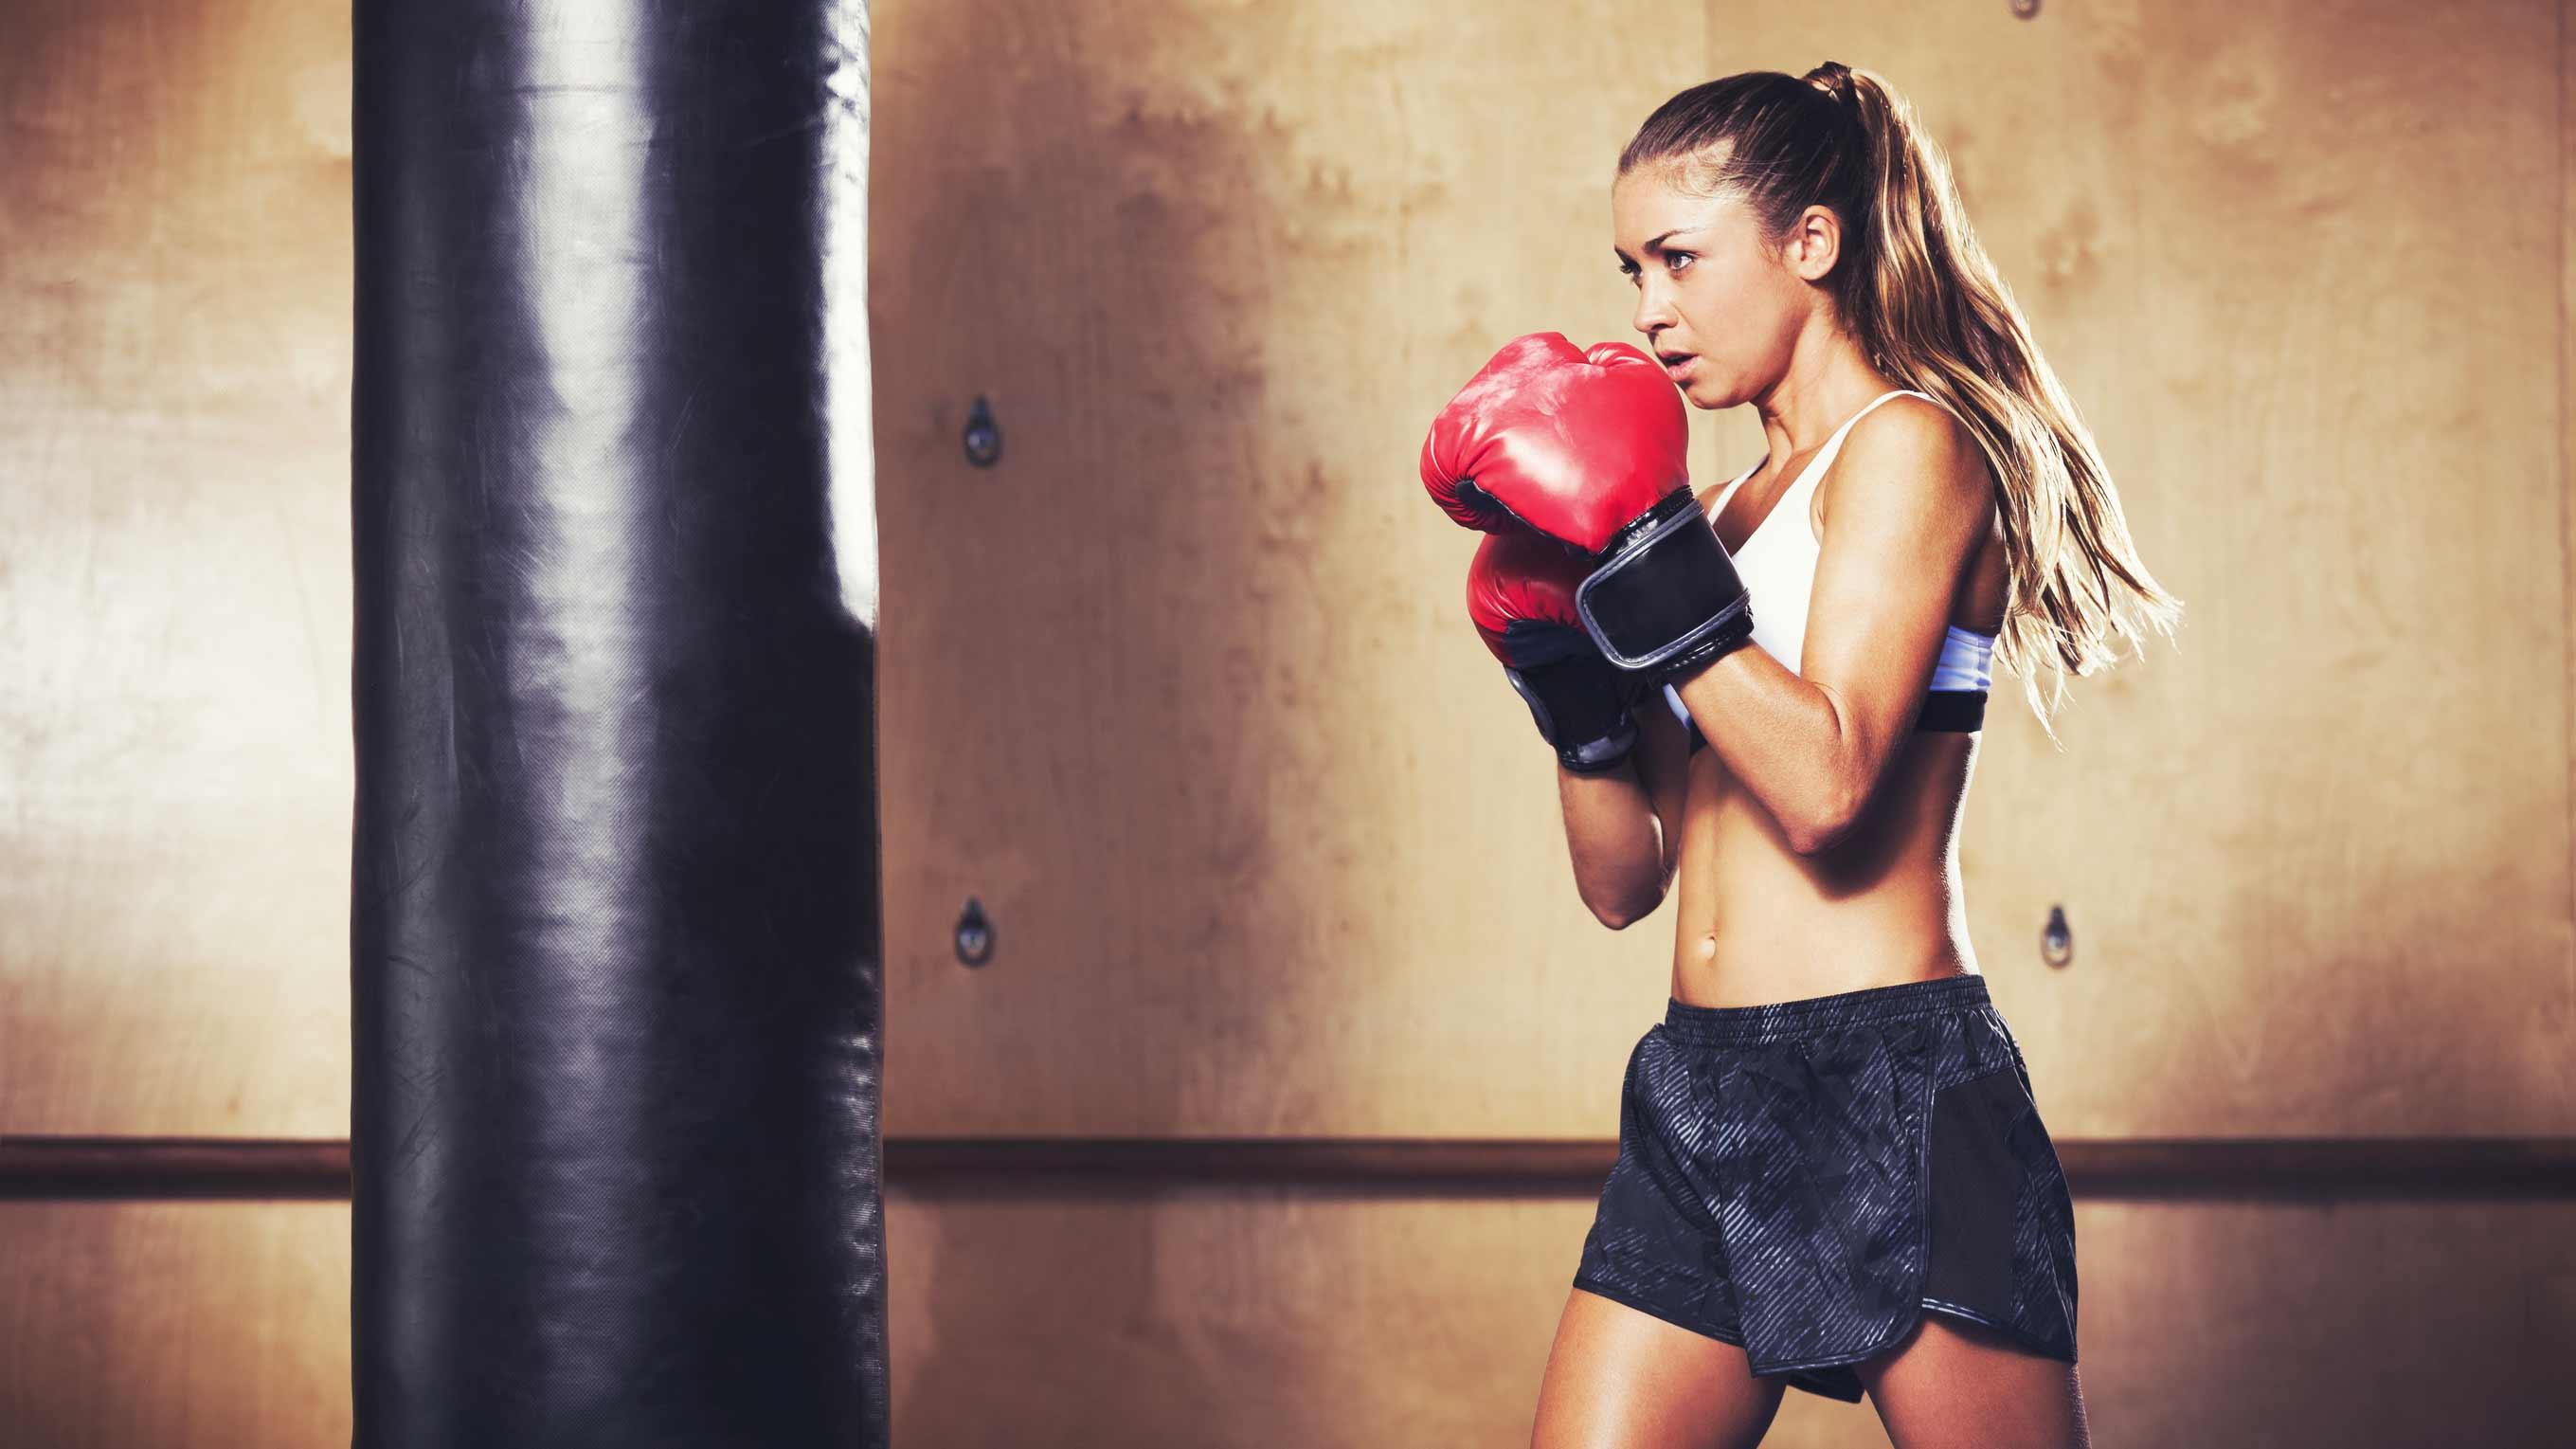 boxe-femme-blonde-gants